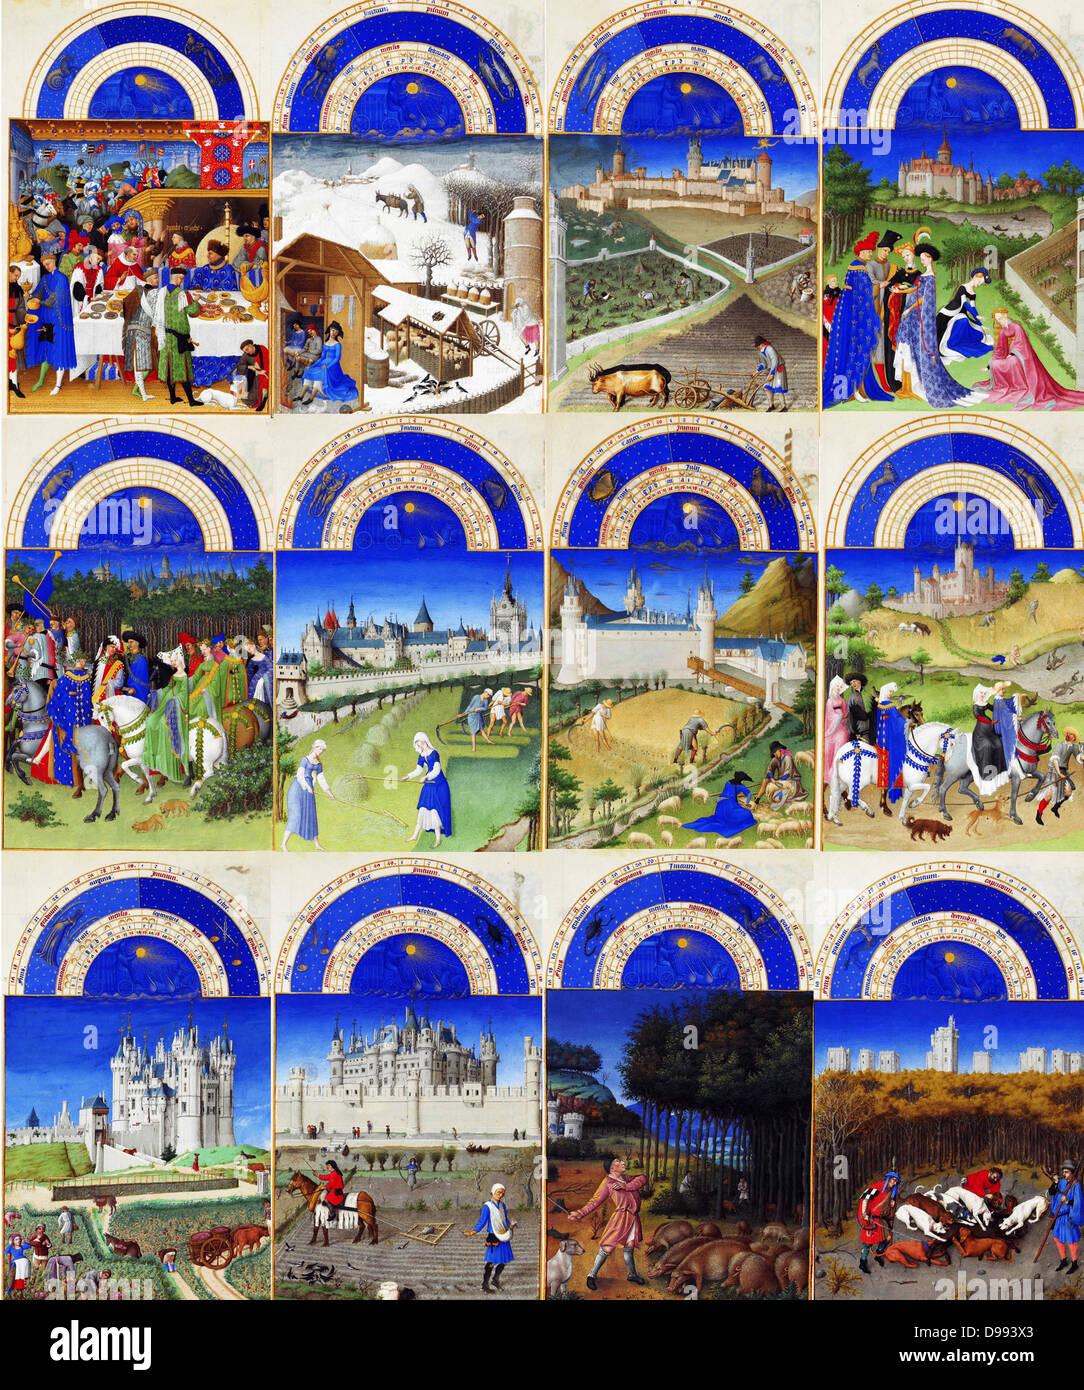 Labours of the months 'Très Riches Heures 1413-1416, the Duc de Berry. Illumination on parchment, Chantilly, - Stock Image